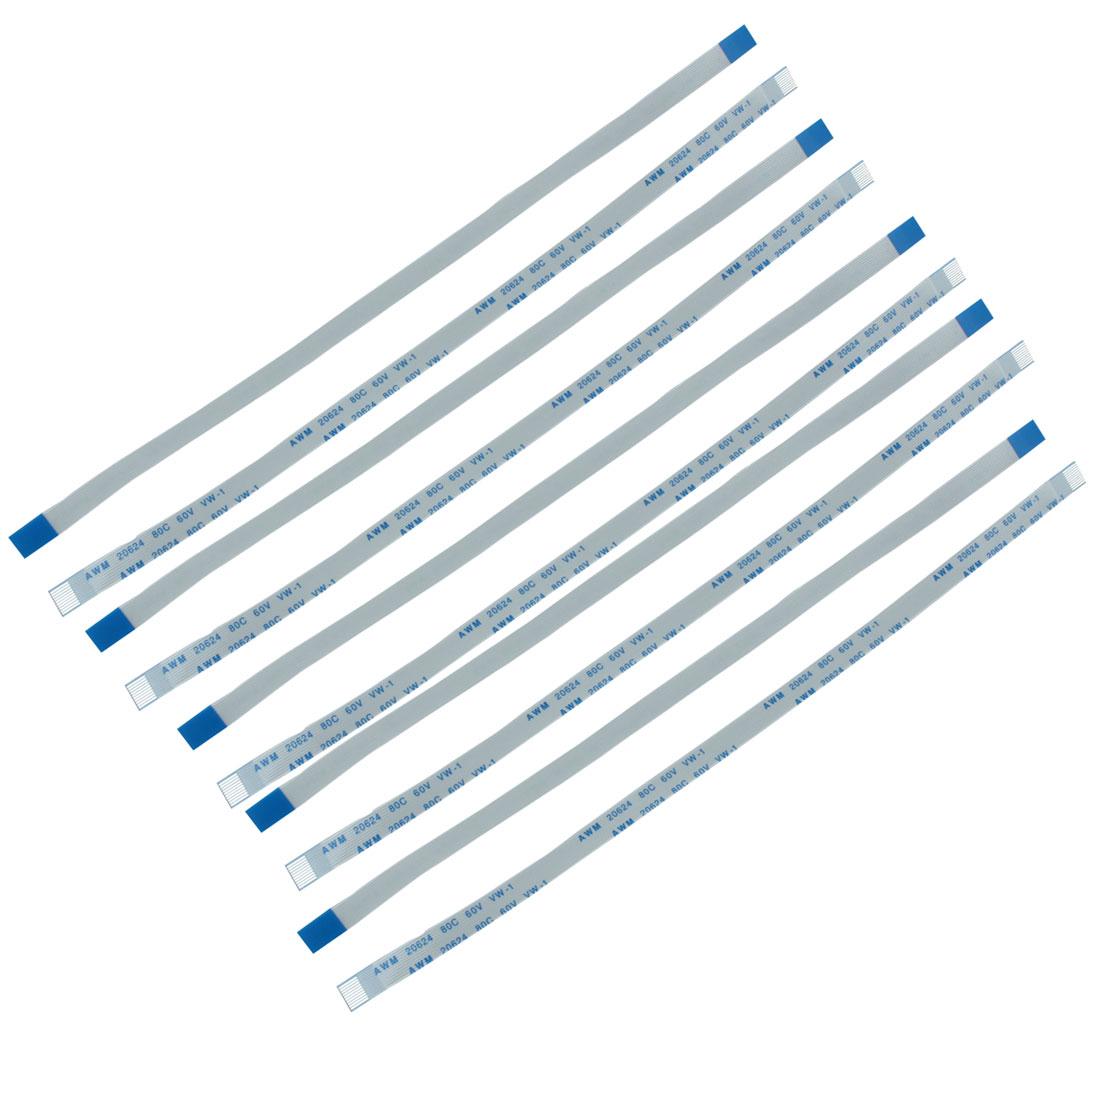 10Pcs 0.5mm Pitch 10 Pin AWM 20624 80C 60V VW-1 Flexible Flat Cable FFC 200mm